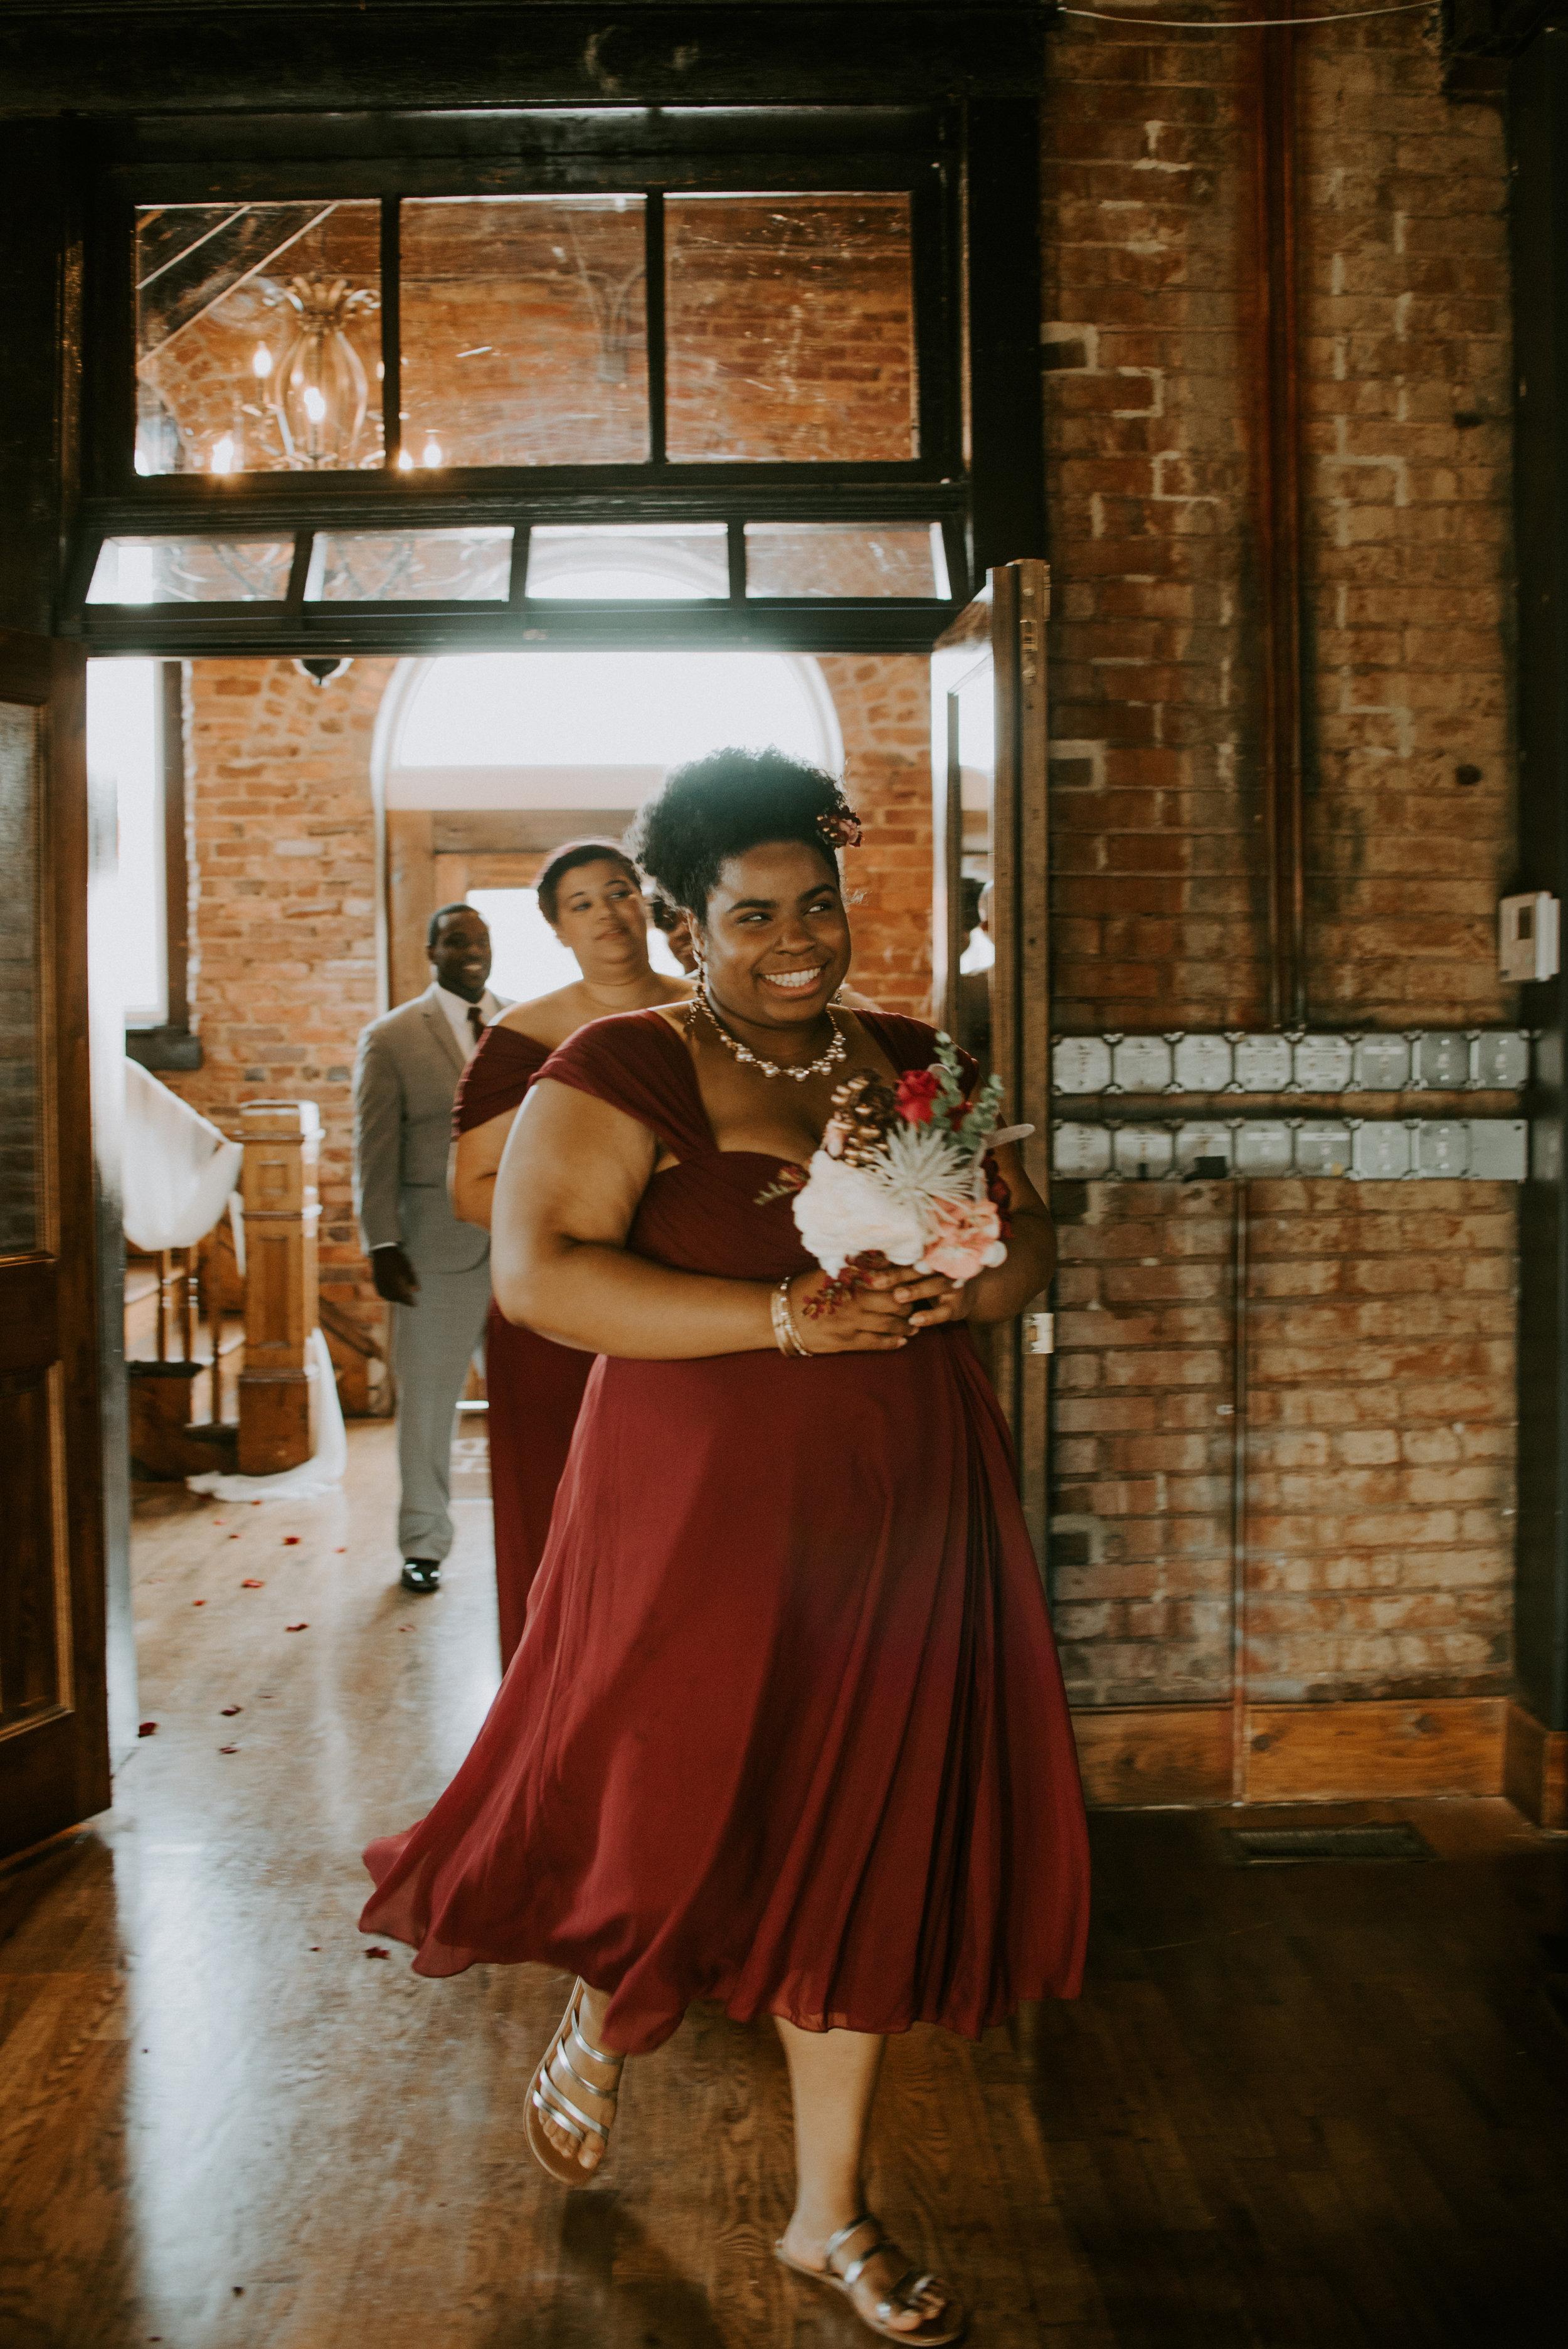 WonderlyCreative_Wedding_6.7.18_Khara&Dwayne_-816.jpg